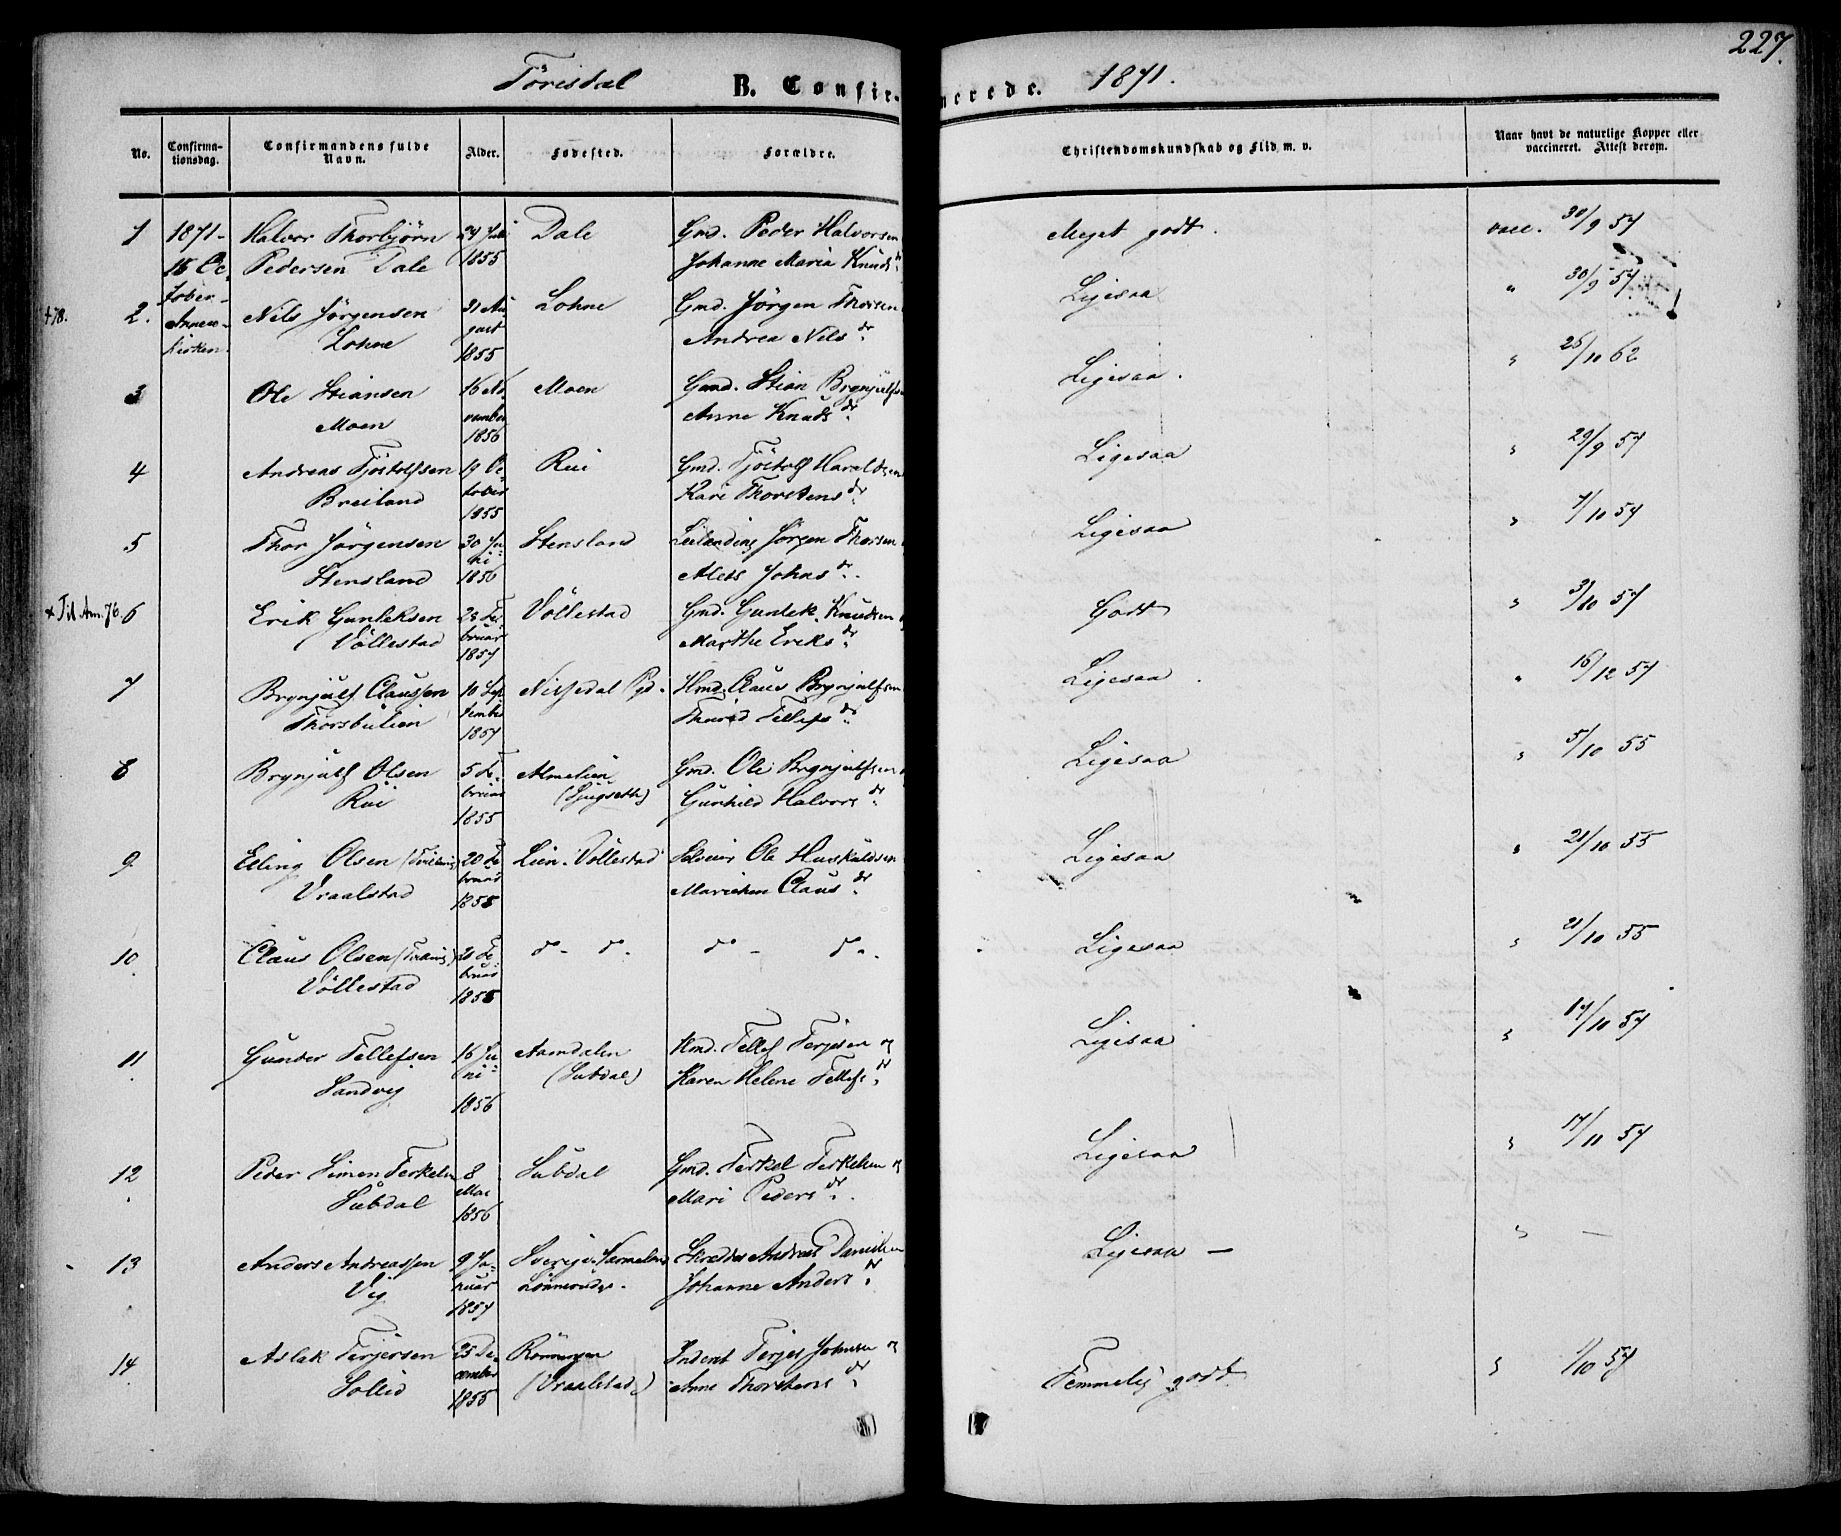 SAKO, Drangedal kirkebøker, F/Fa/L0008: Ministerialbok nr. 8, 1857-1871, s. 227